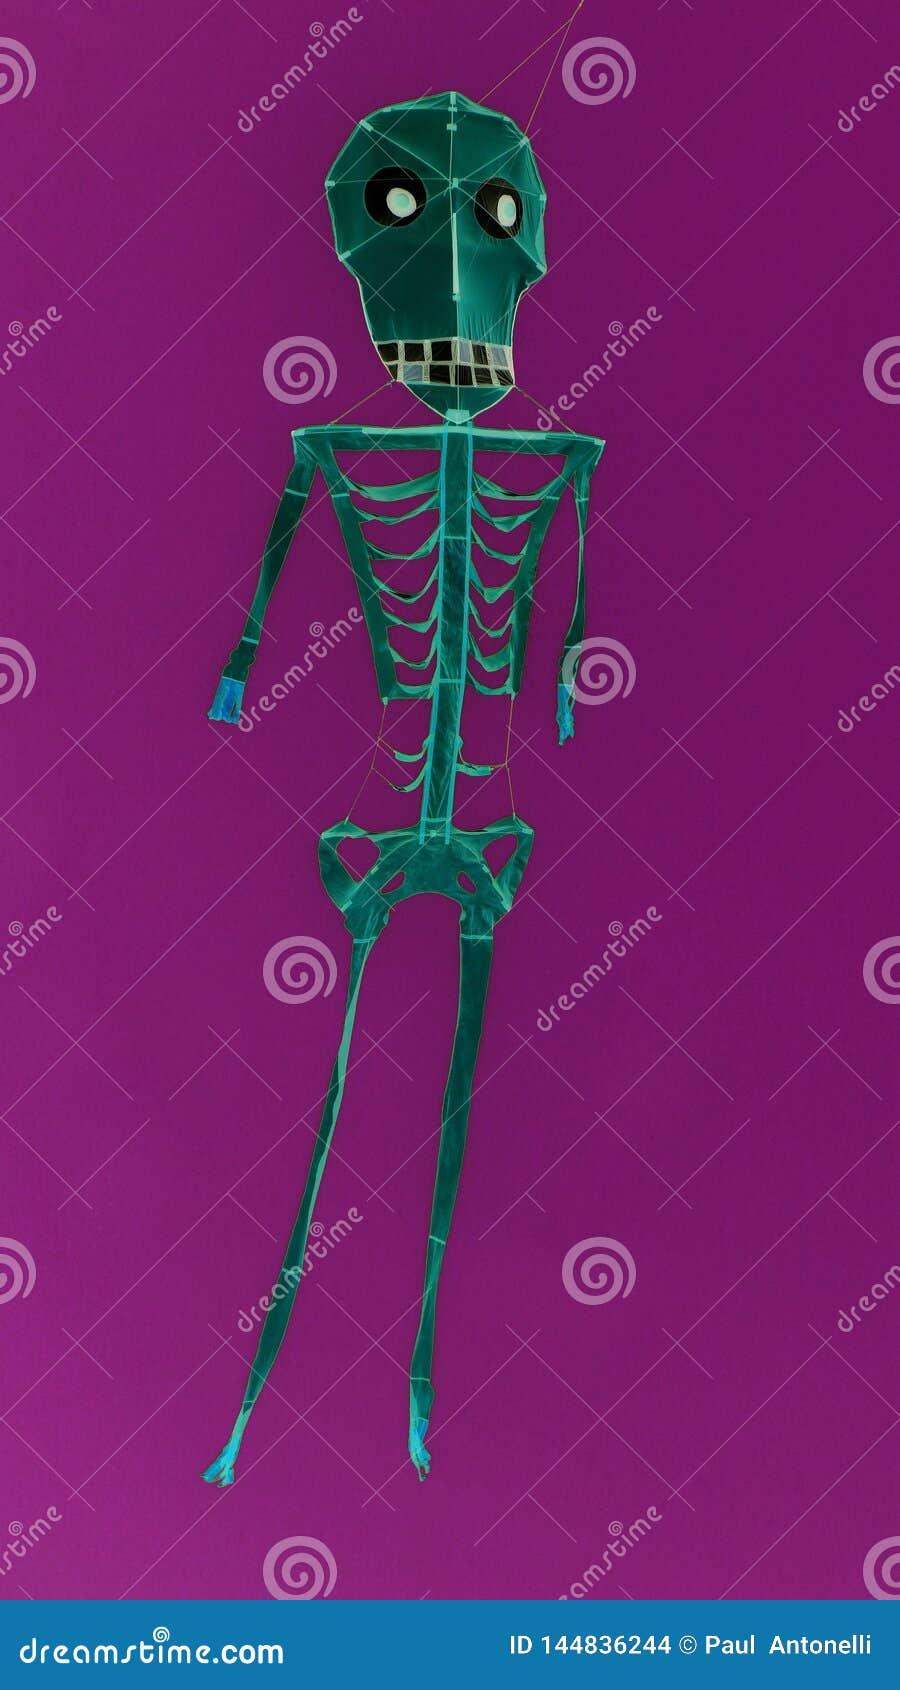 Cerf-volant squelettique effrayant artistique